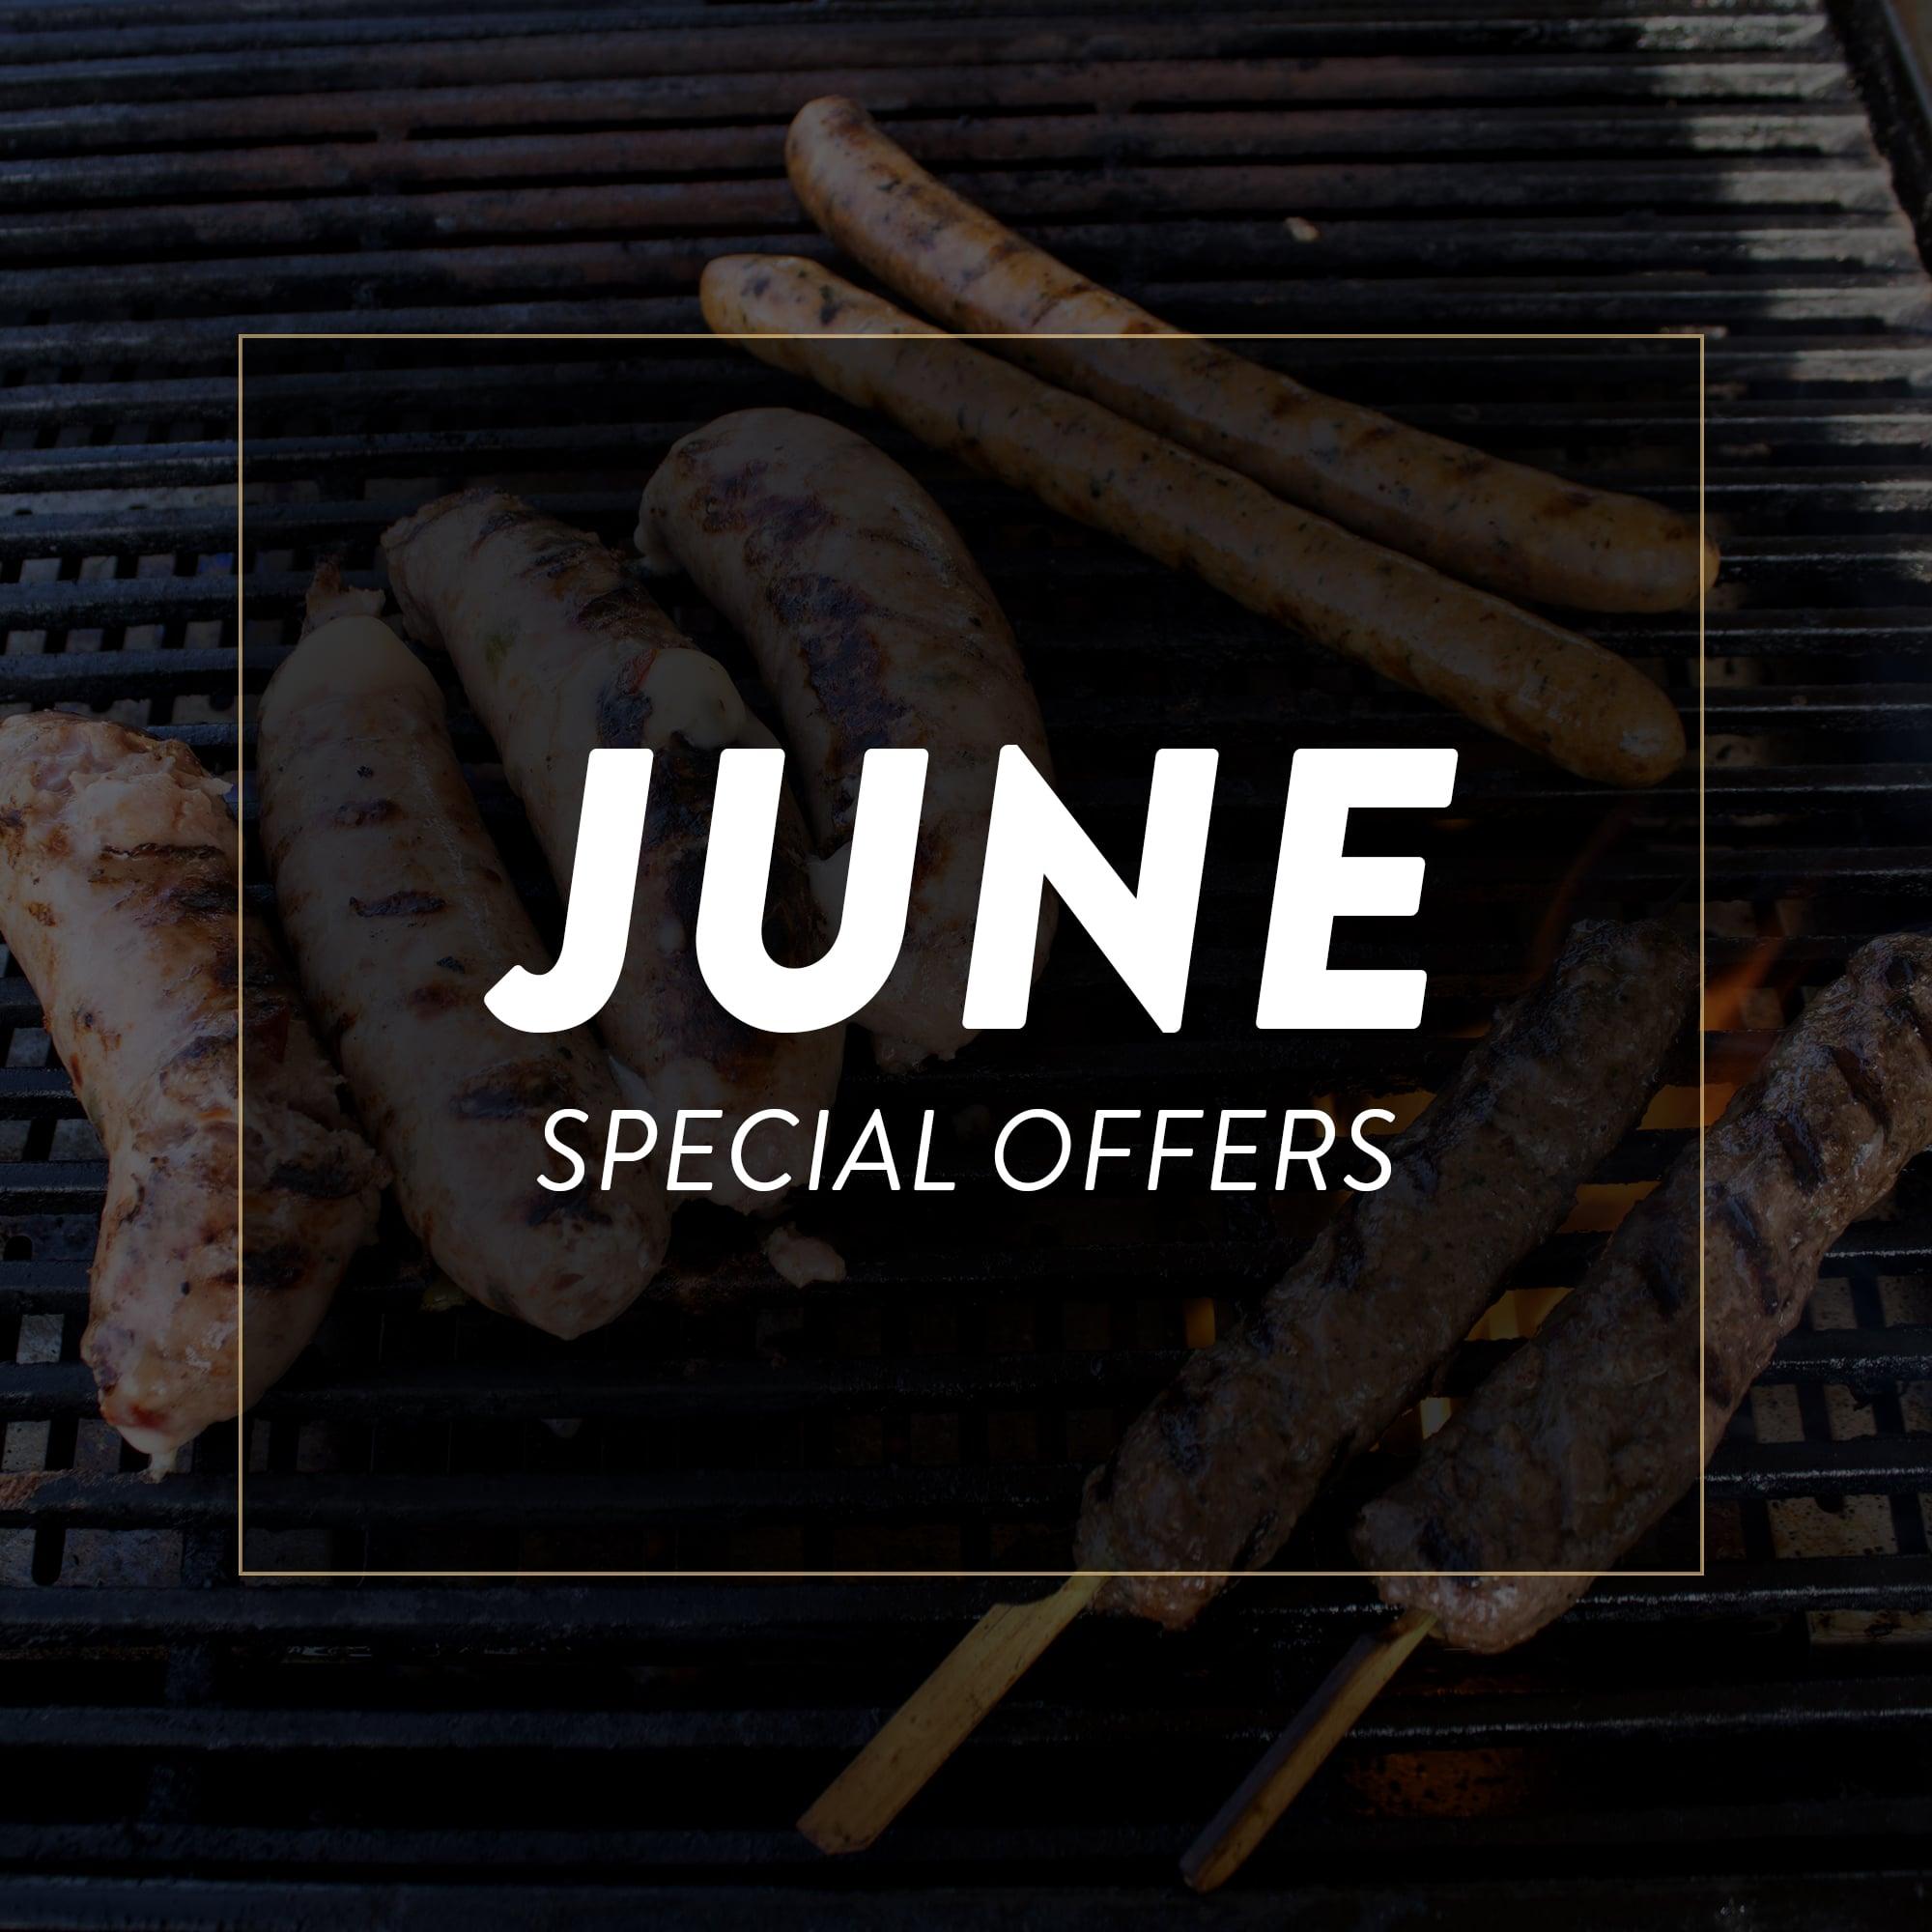 June Special Offer